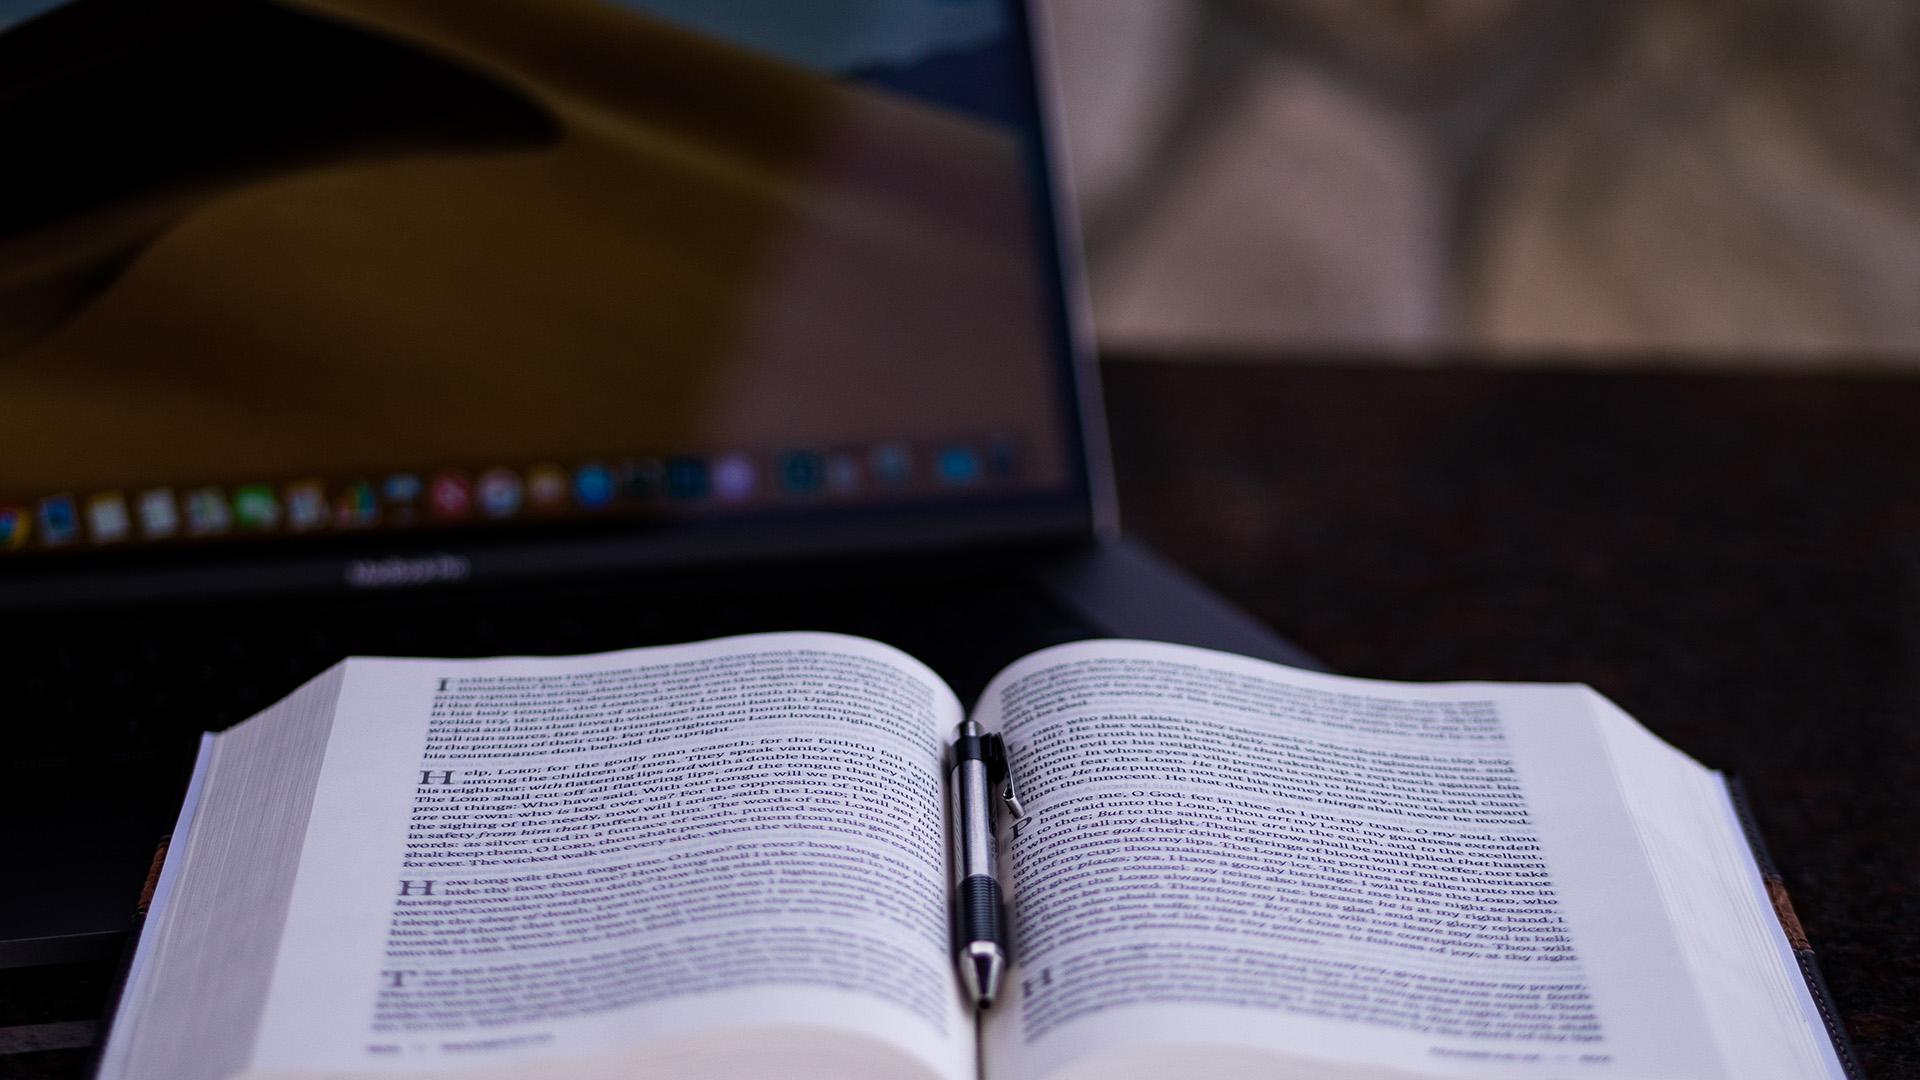 Does Online Church Violate Hebrews 10:25?